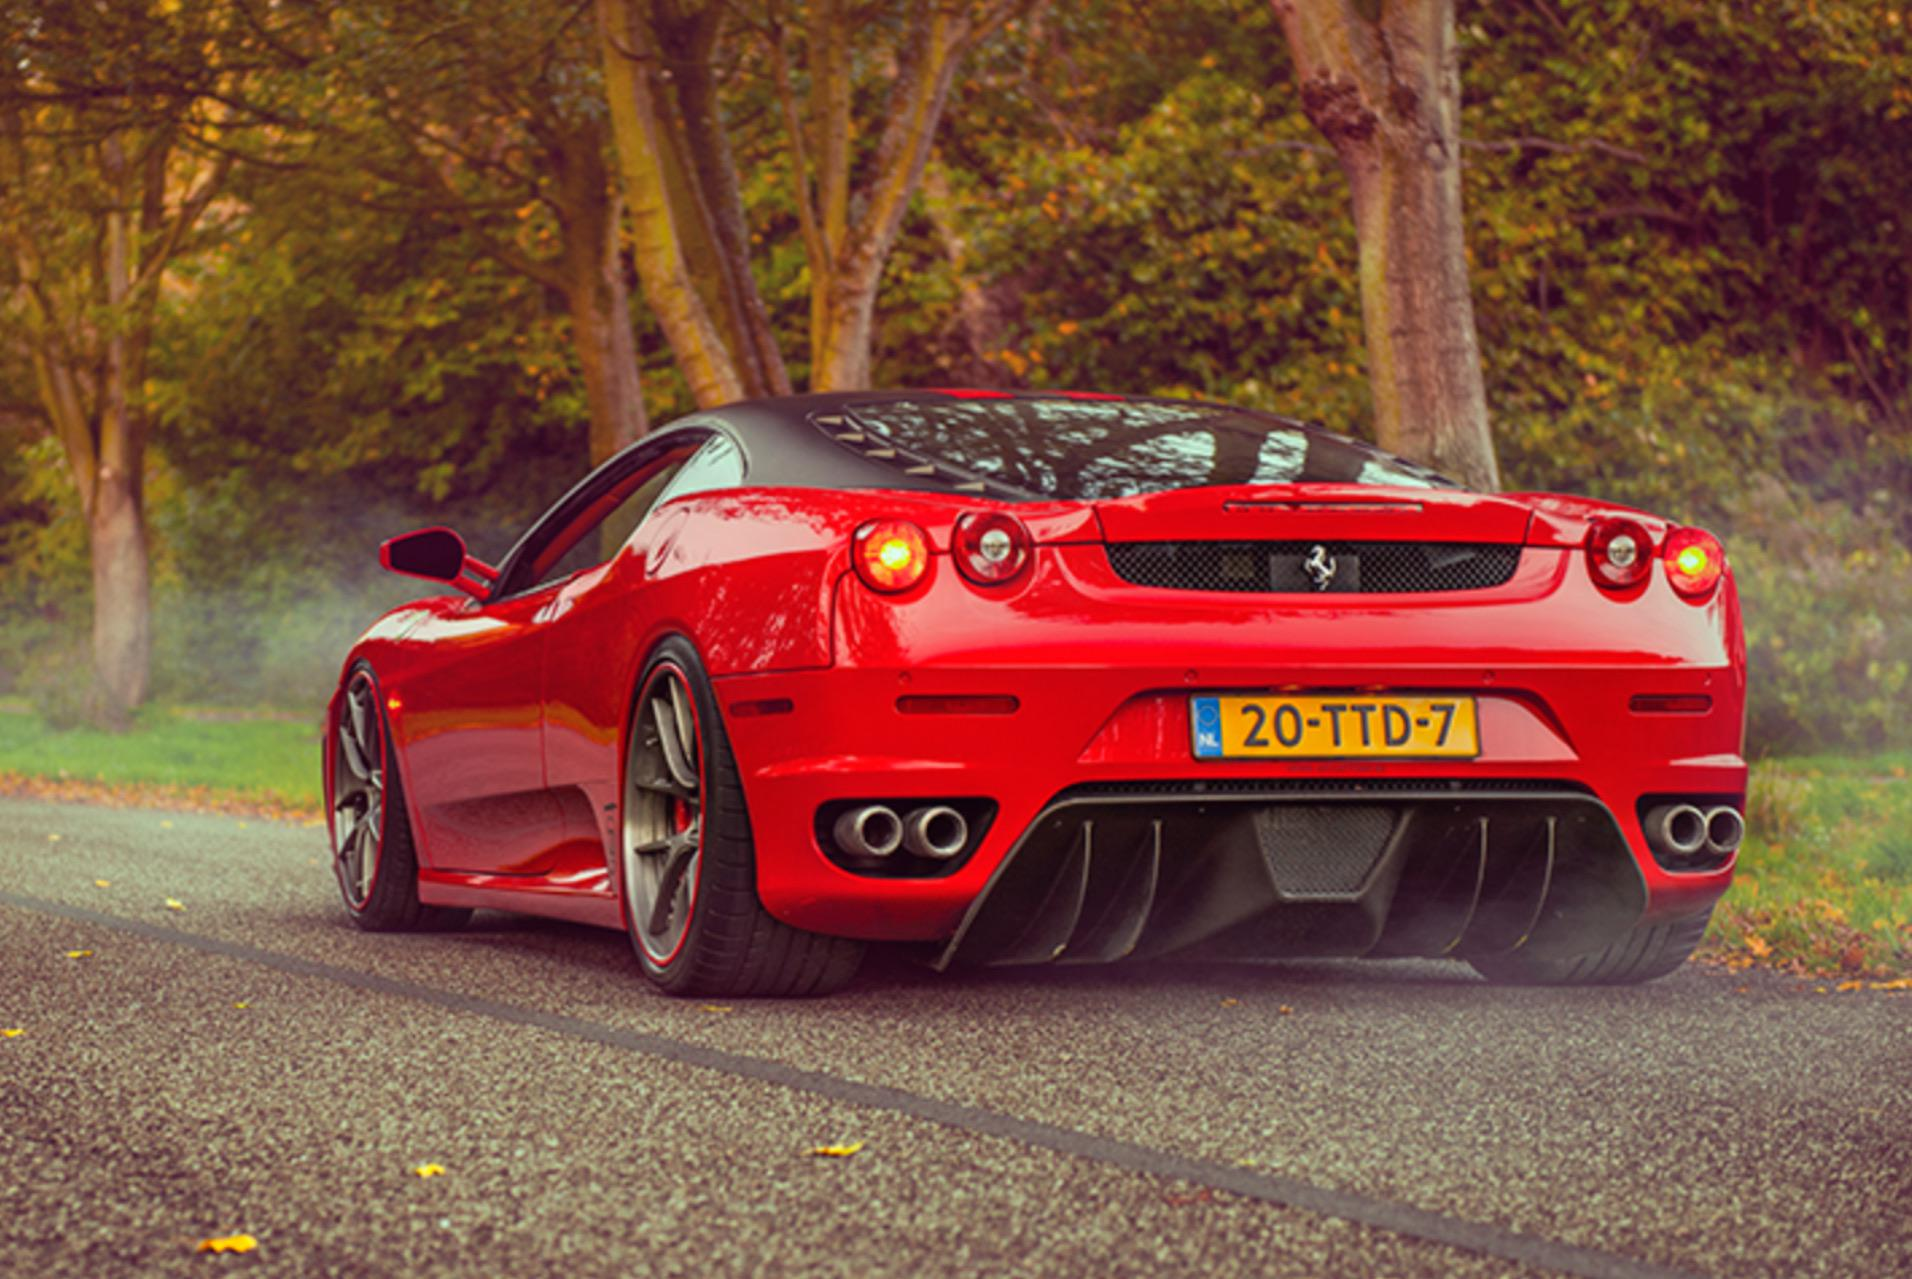 Gorgeous Red Ferrari F430